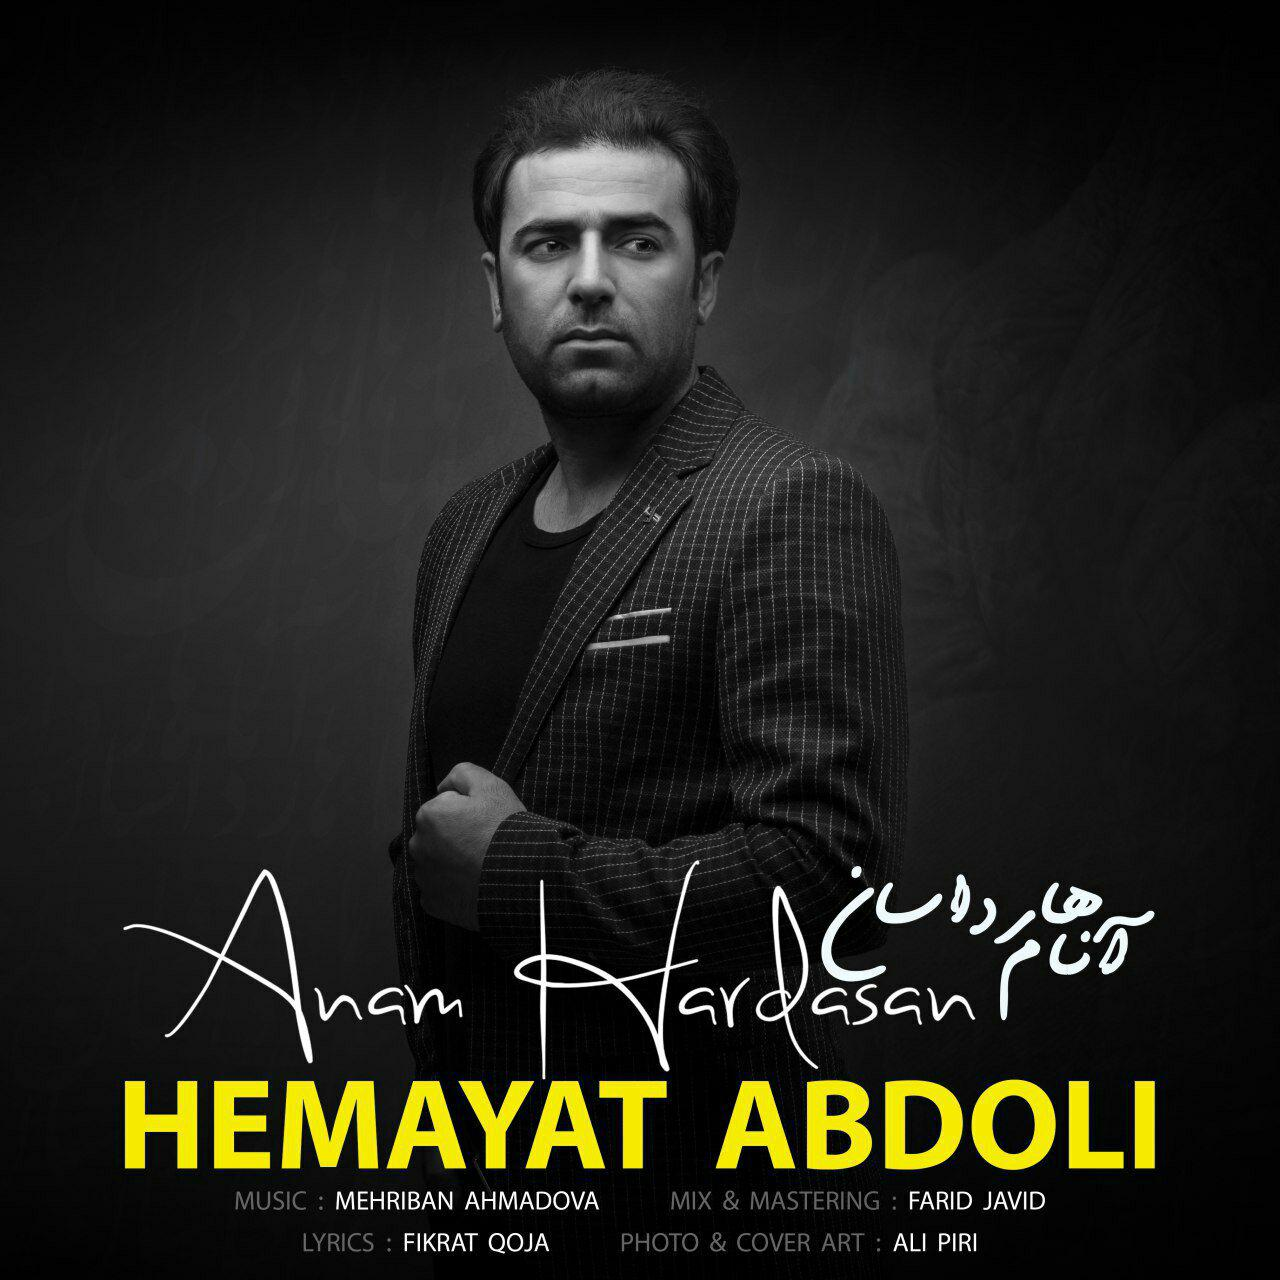 http://s9.picofile.com/file/8333367600/15Hemayat_Abdoli_Anam_Hardasan.jpg